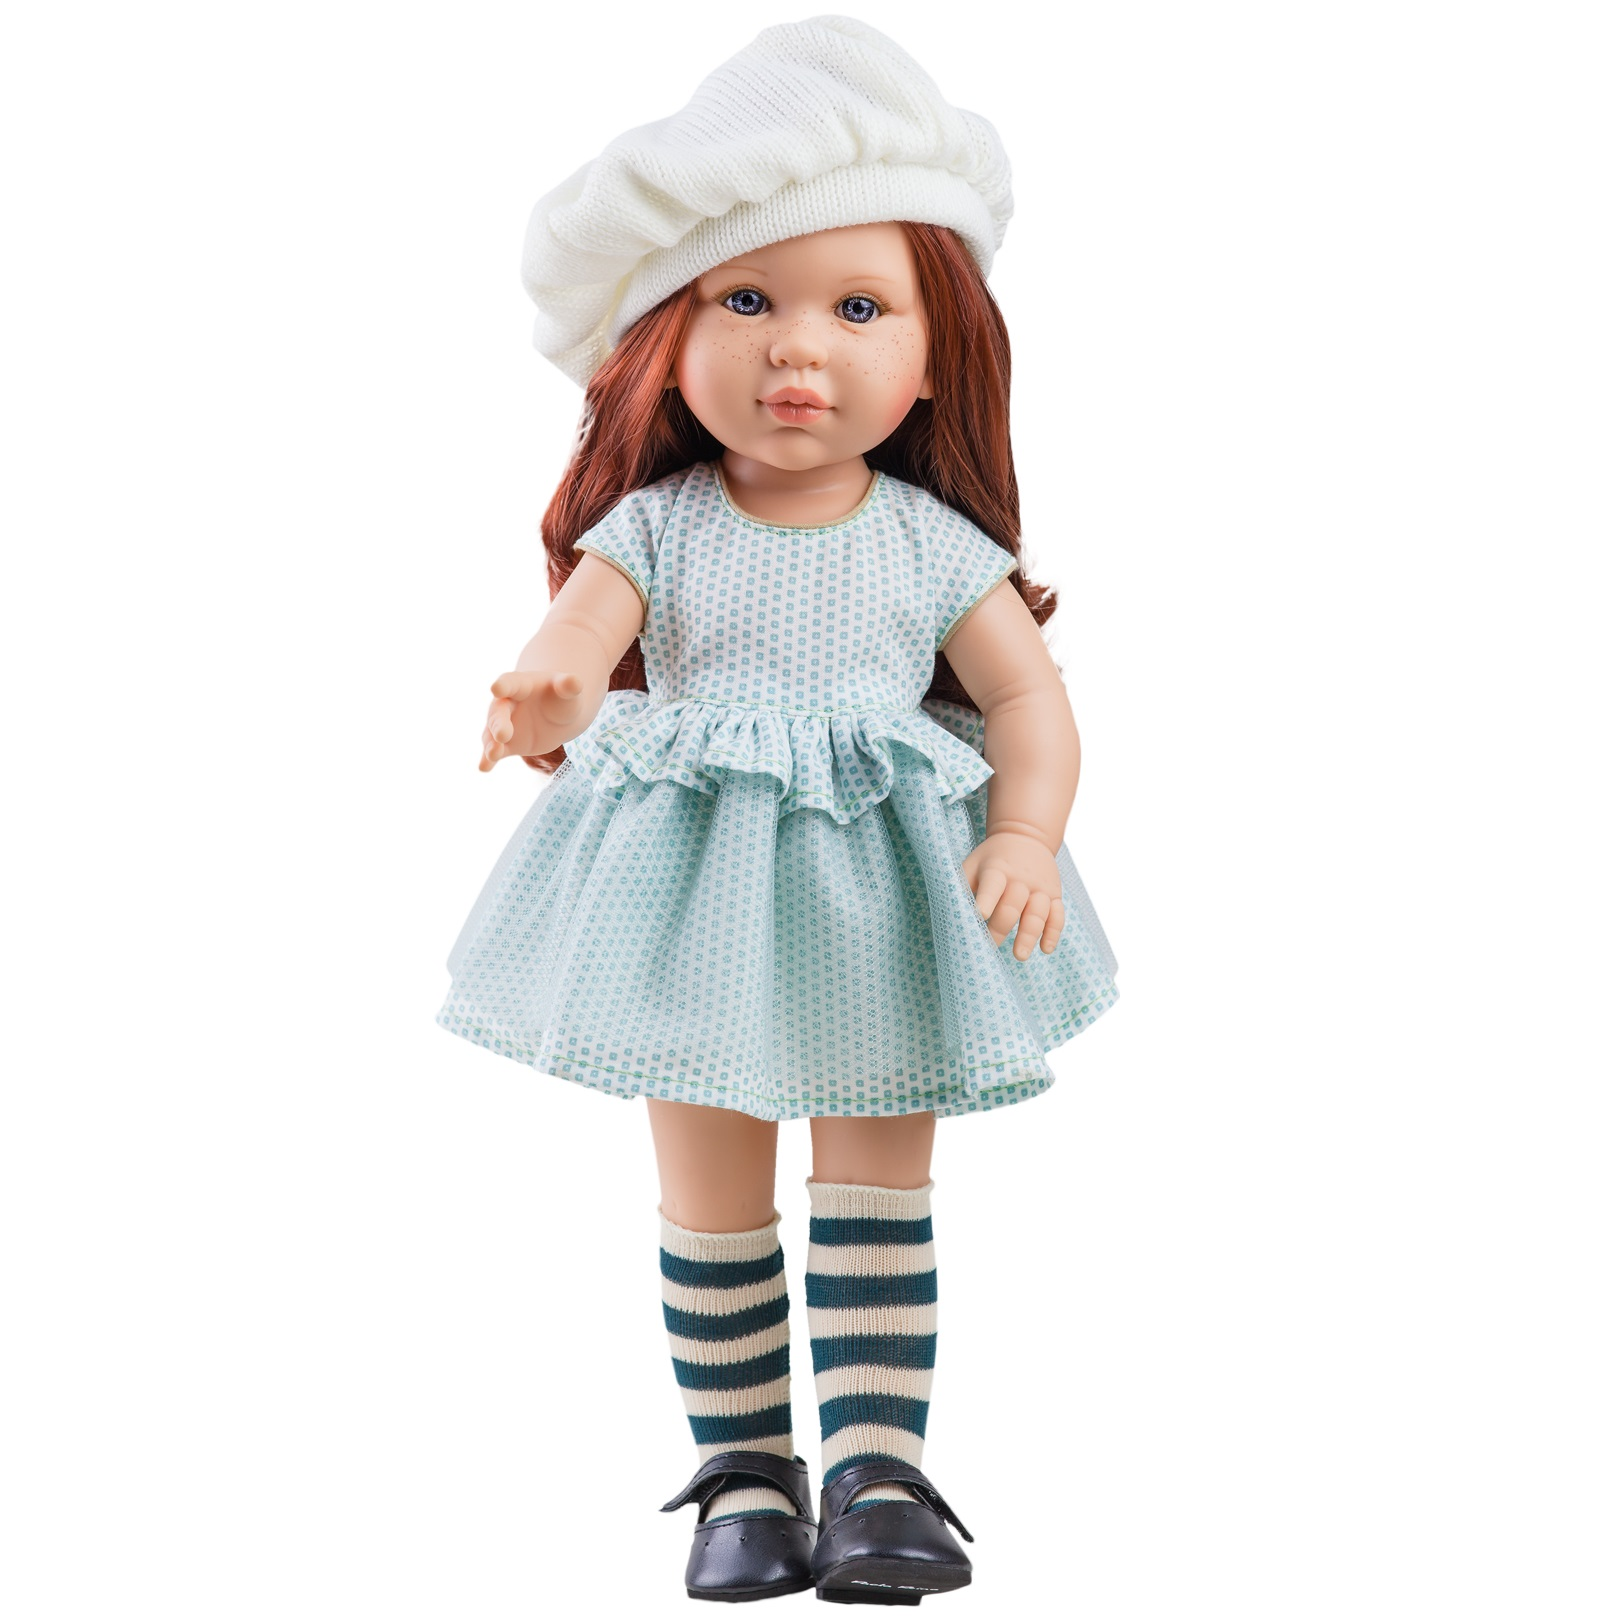 вариант куклы паола рейна каталог все фото независимости площади вида